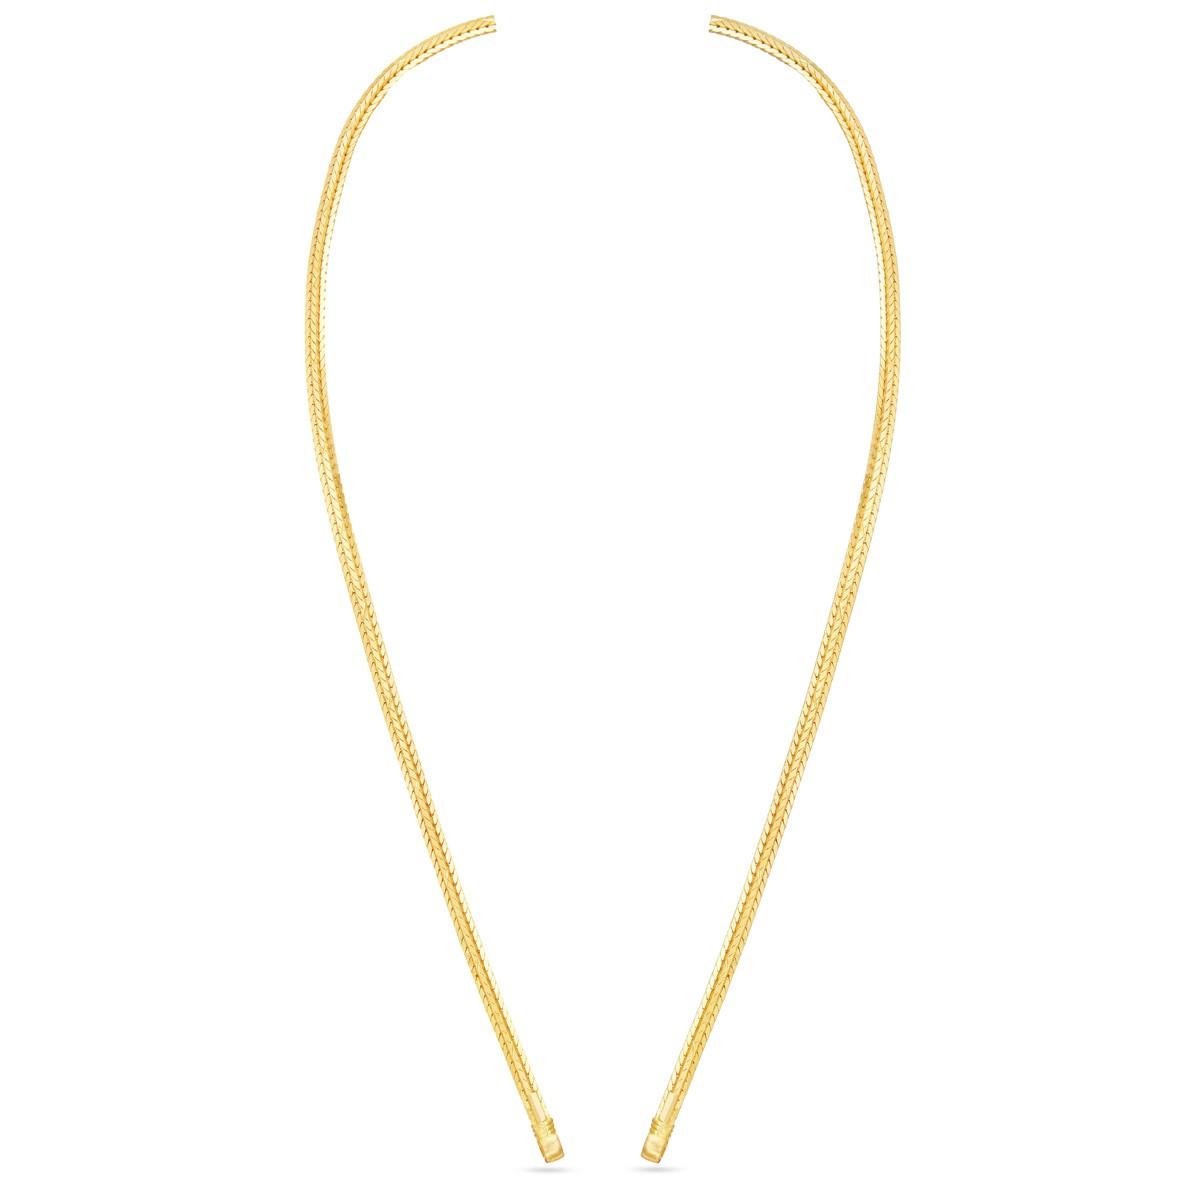 Buy Roja Kodi Sarudu Online Buy Thick Gold Chain Buy